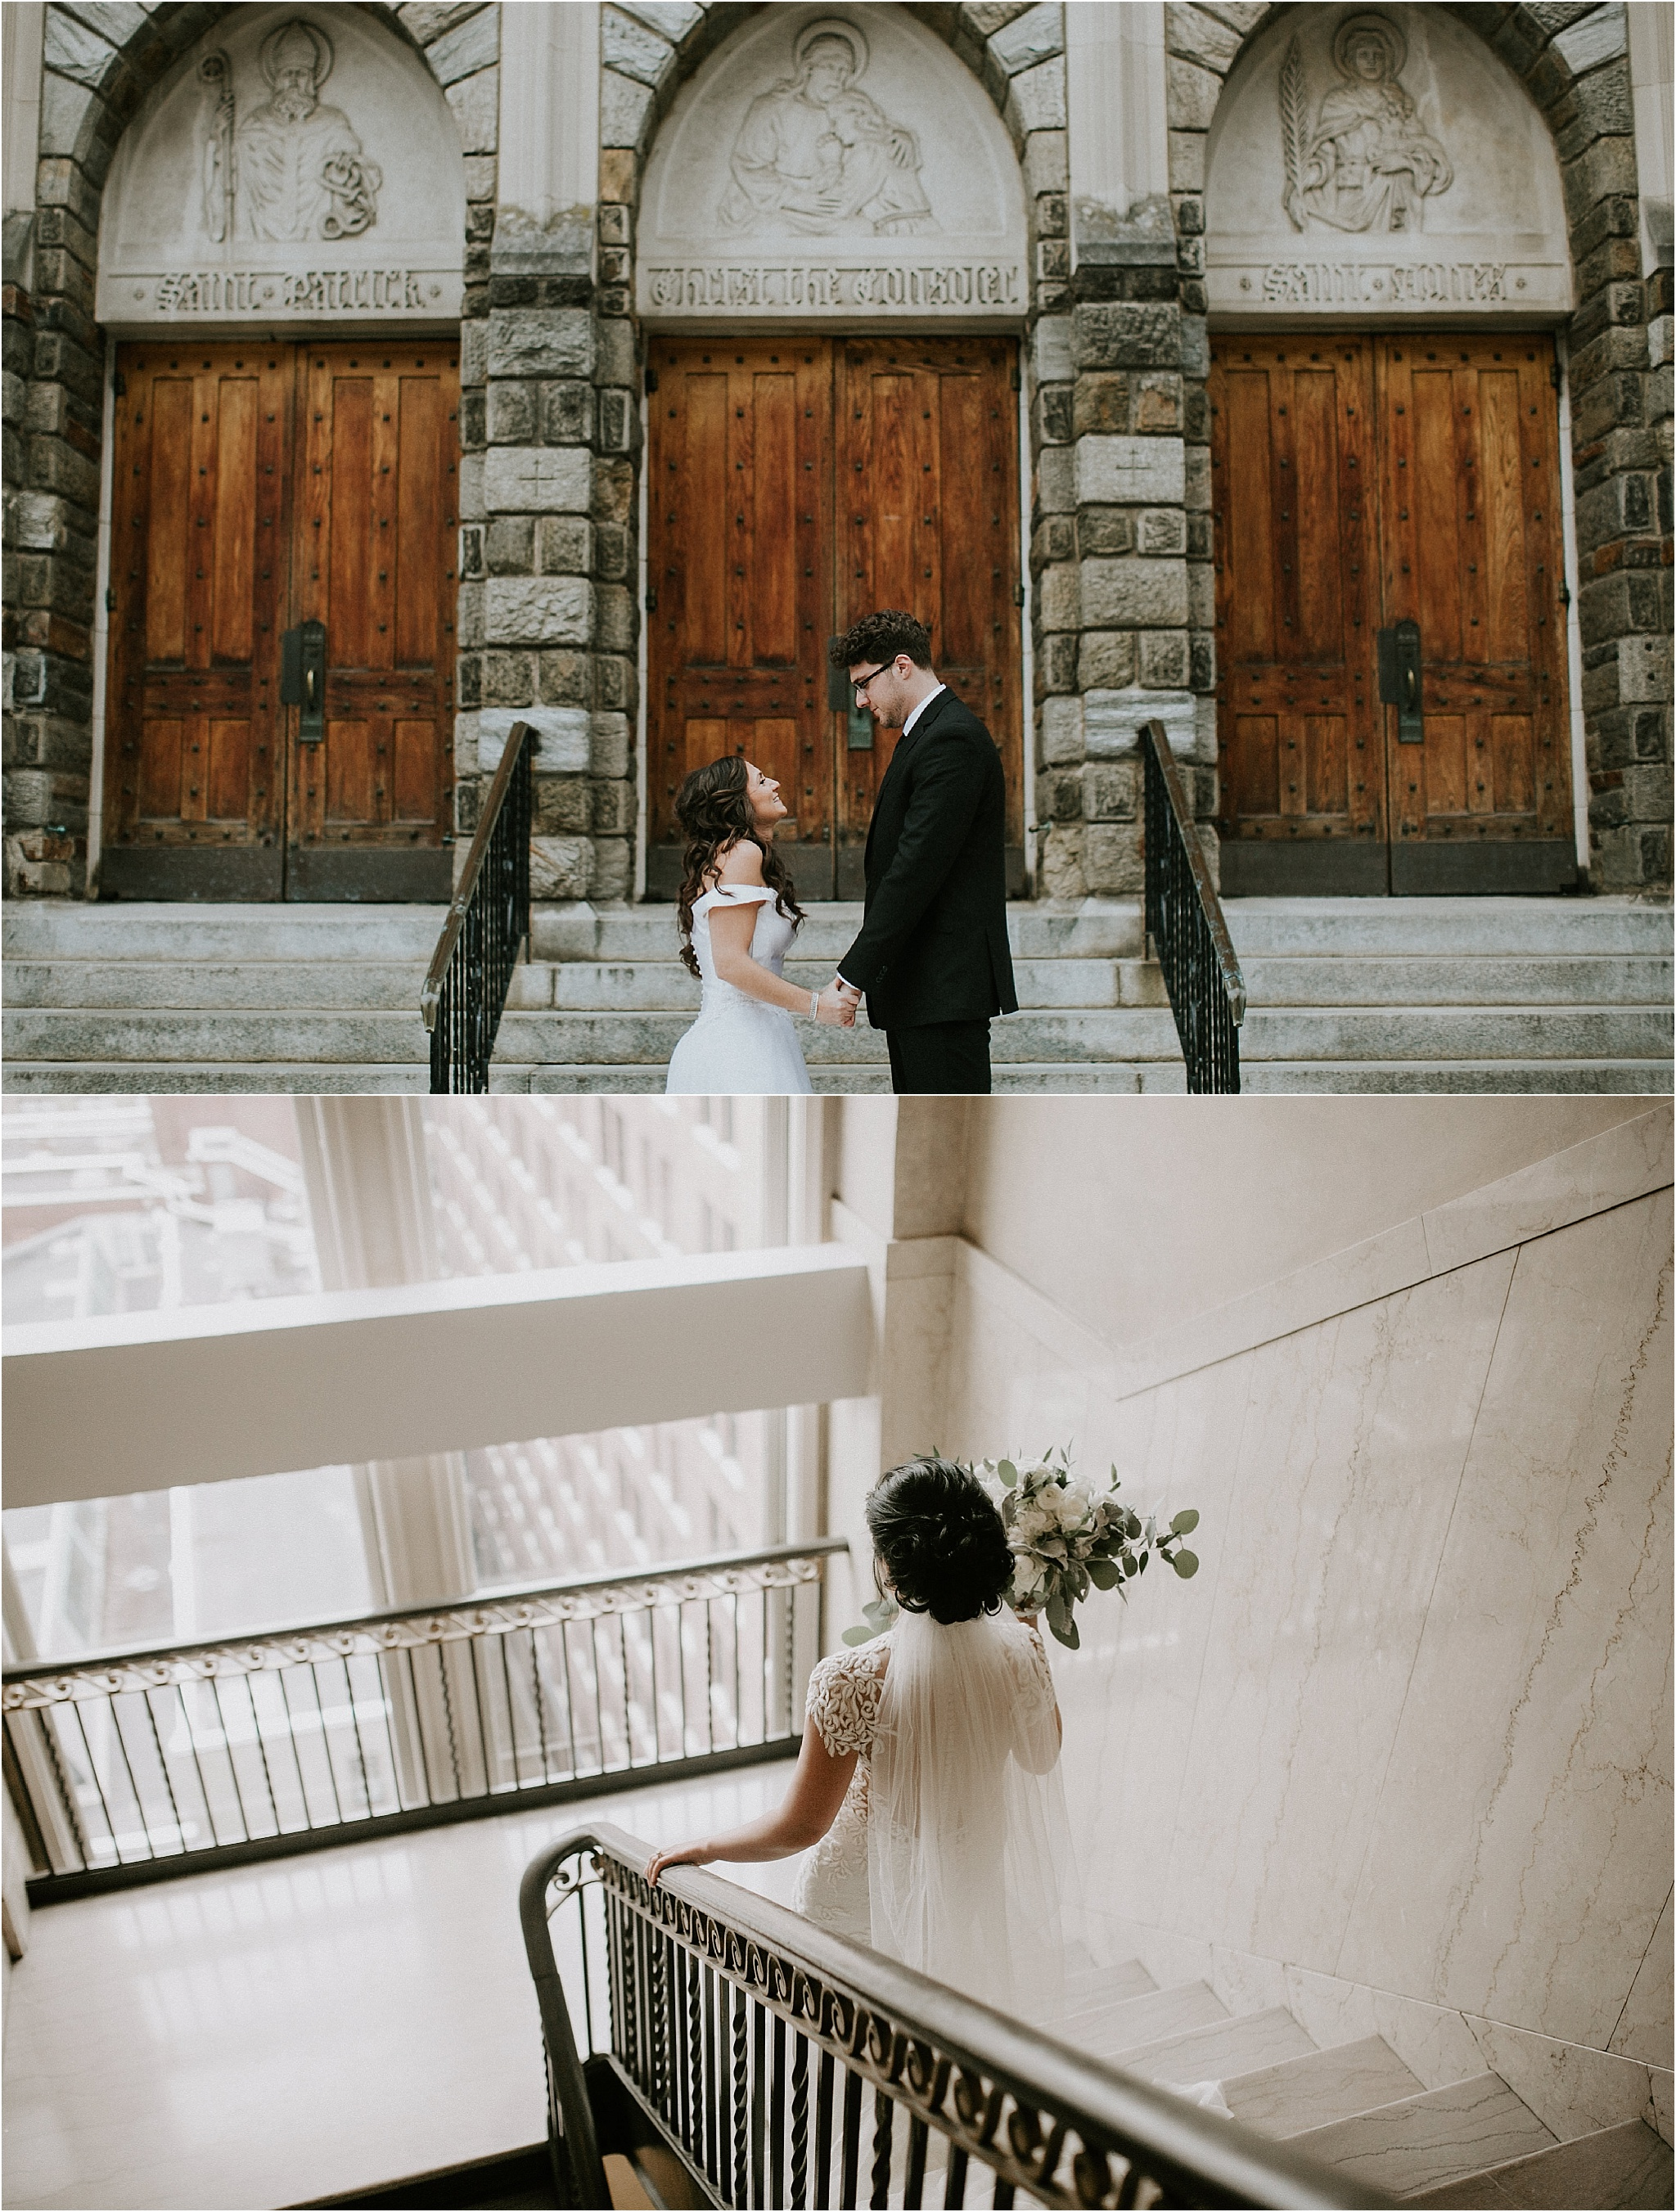 Sarah_Brookhart_Baltimore_Philly_Wedding_Photographer_0026.jpg